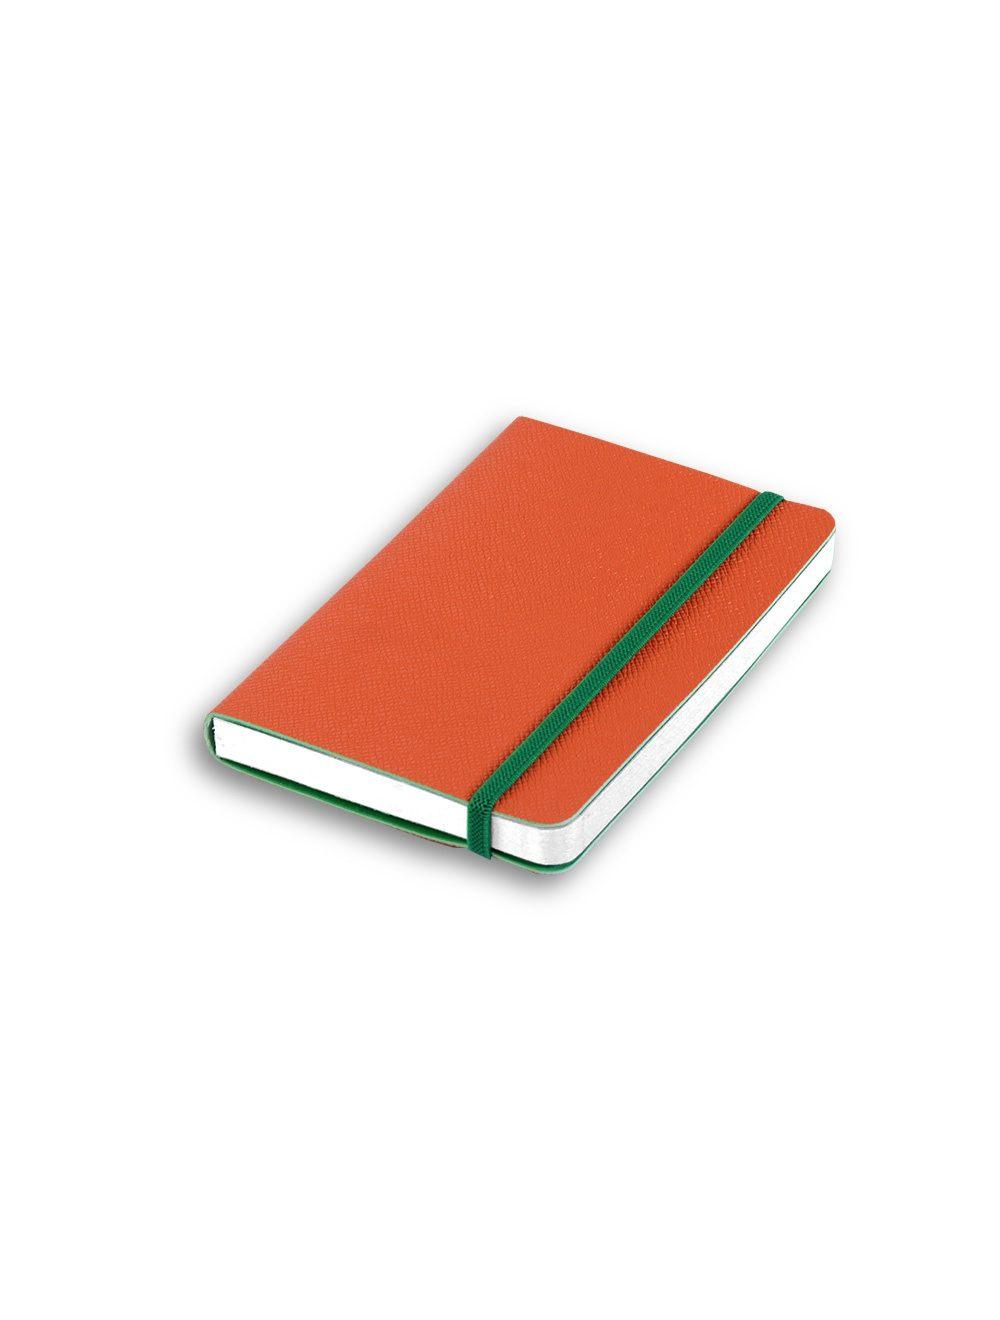 Journal with Elastic 14,5x21 cm (white internal page) - Mandarin